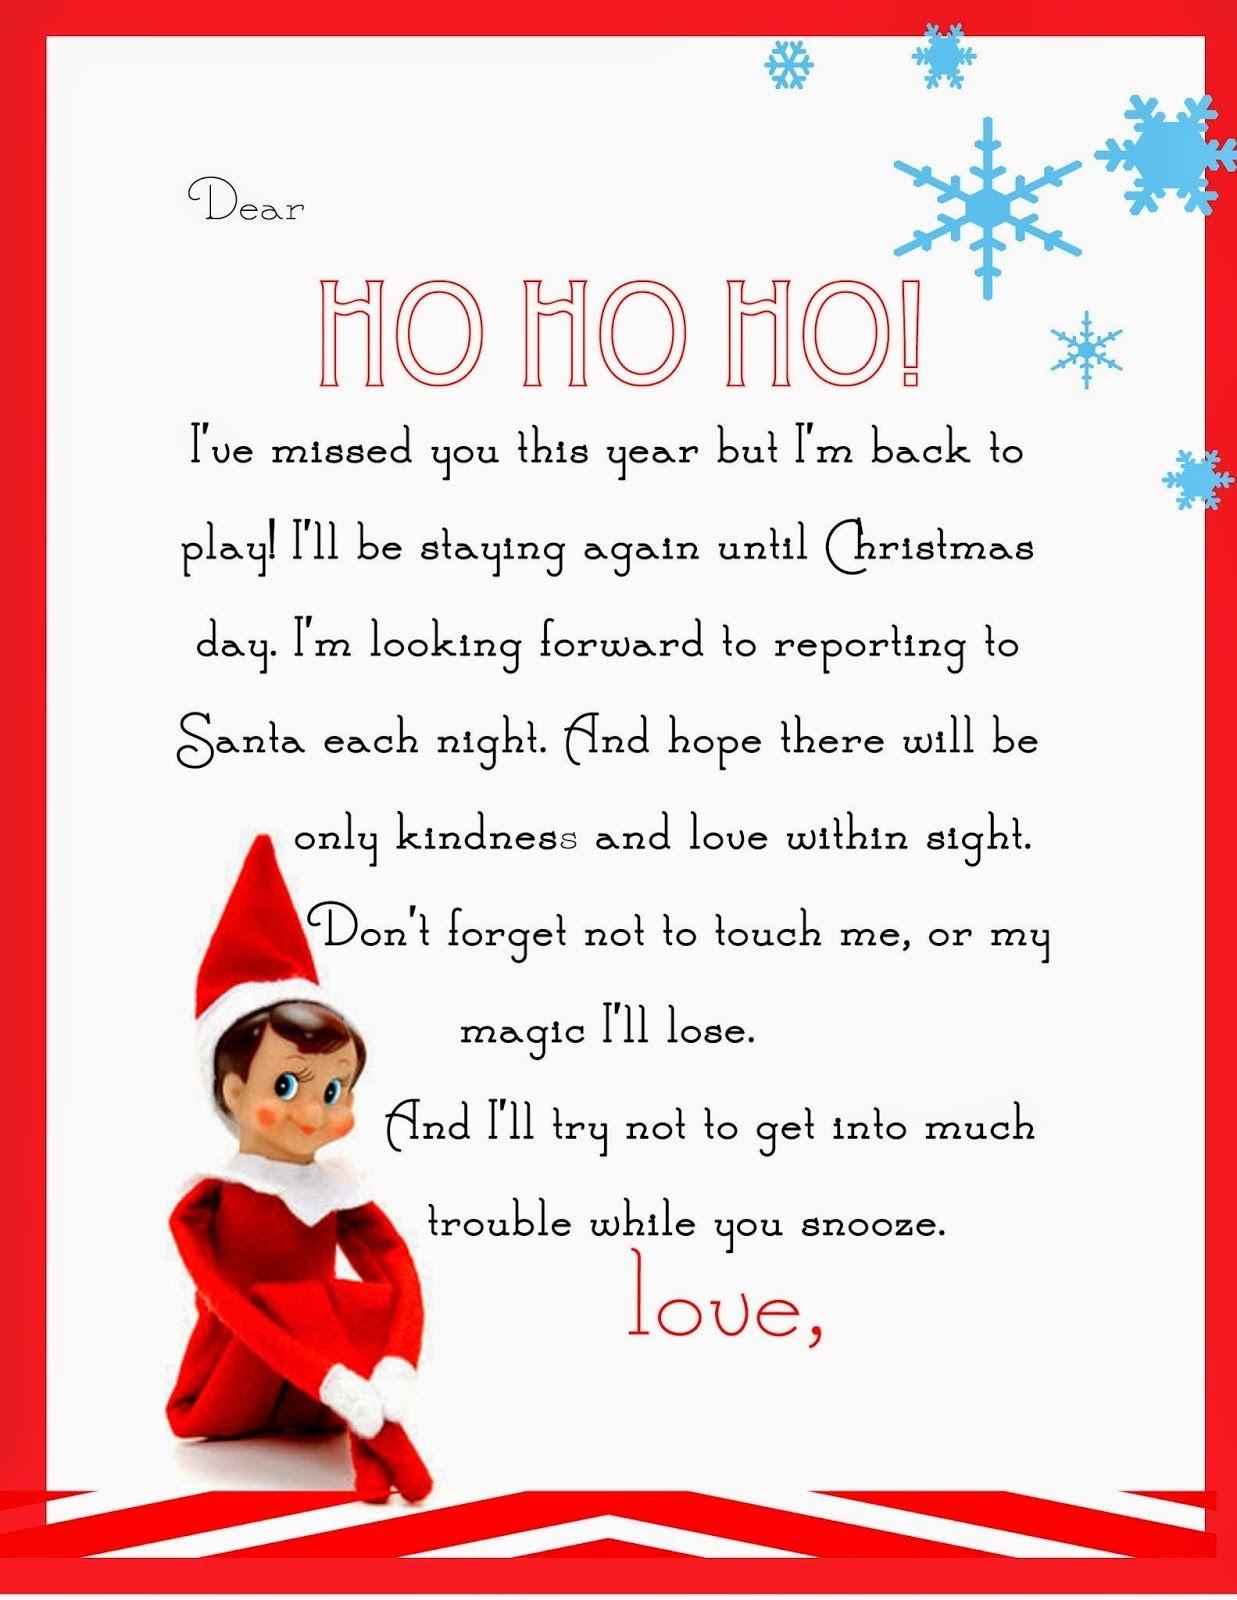 Elf On The Shelf Letter {Free Printable}   Christmas   Elf On The - Goodbye Letter From Elf On The Shelf Free Printable